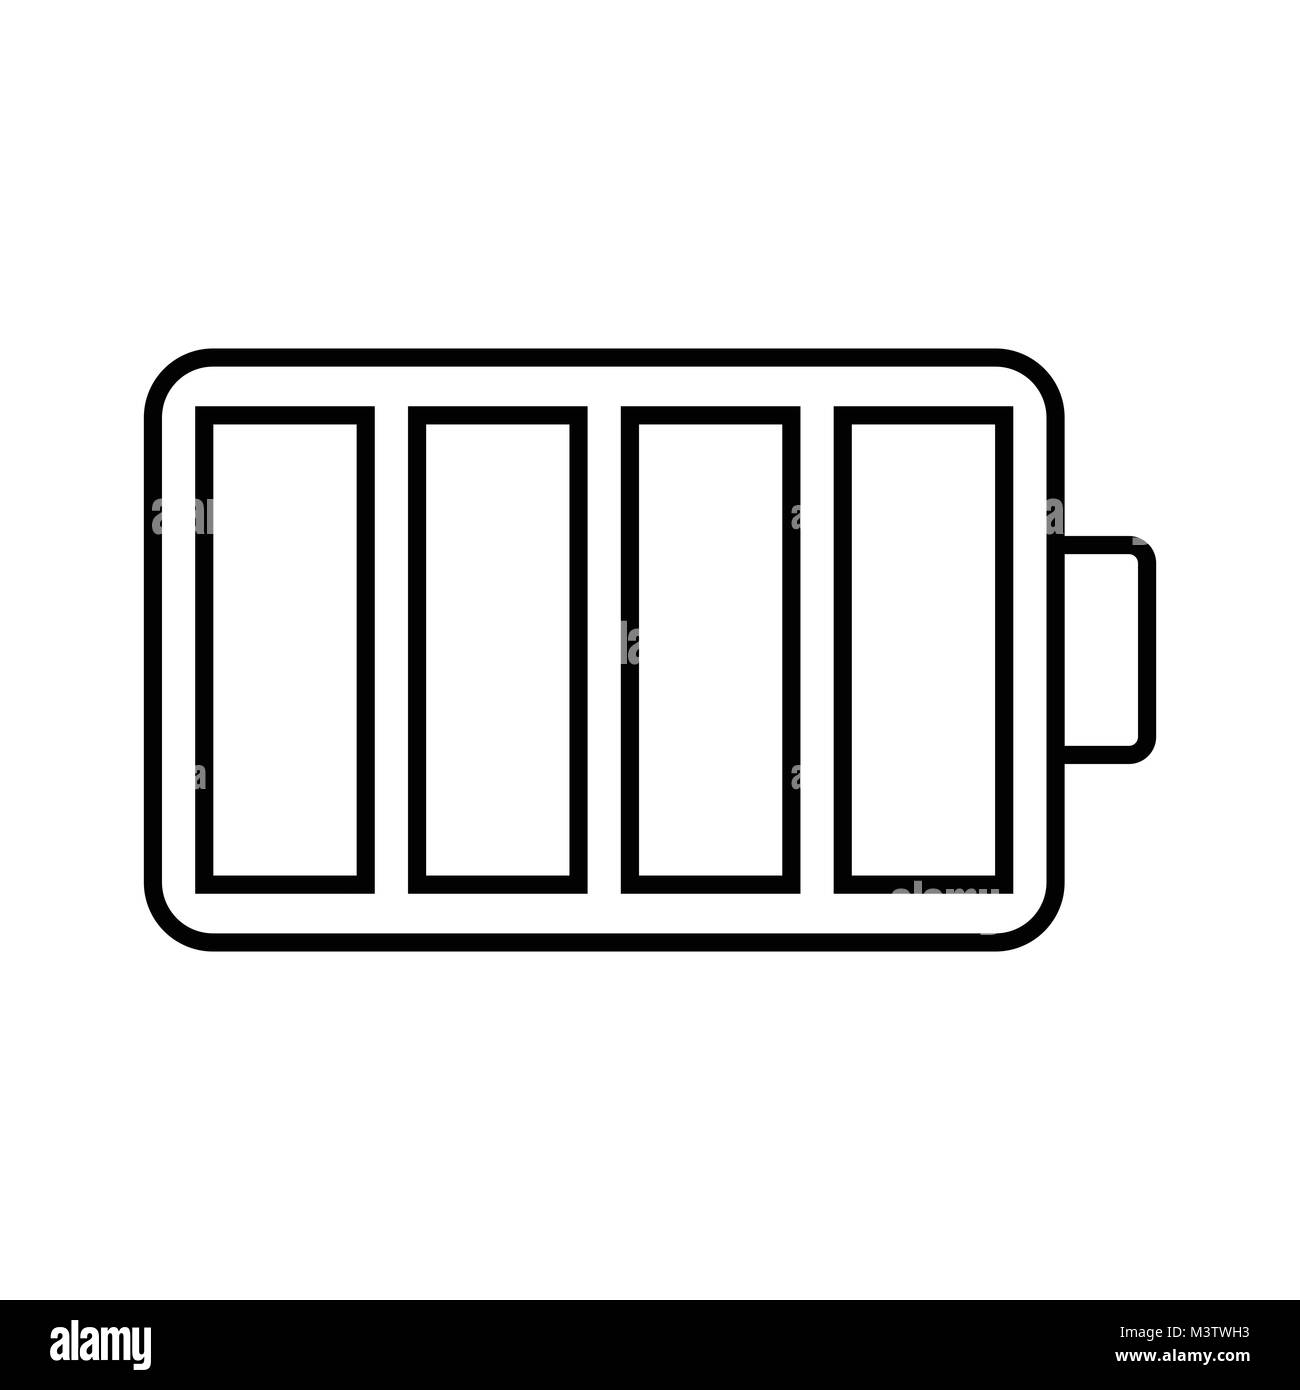 White battery icon - Stock Image